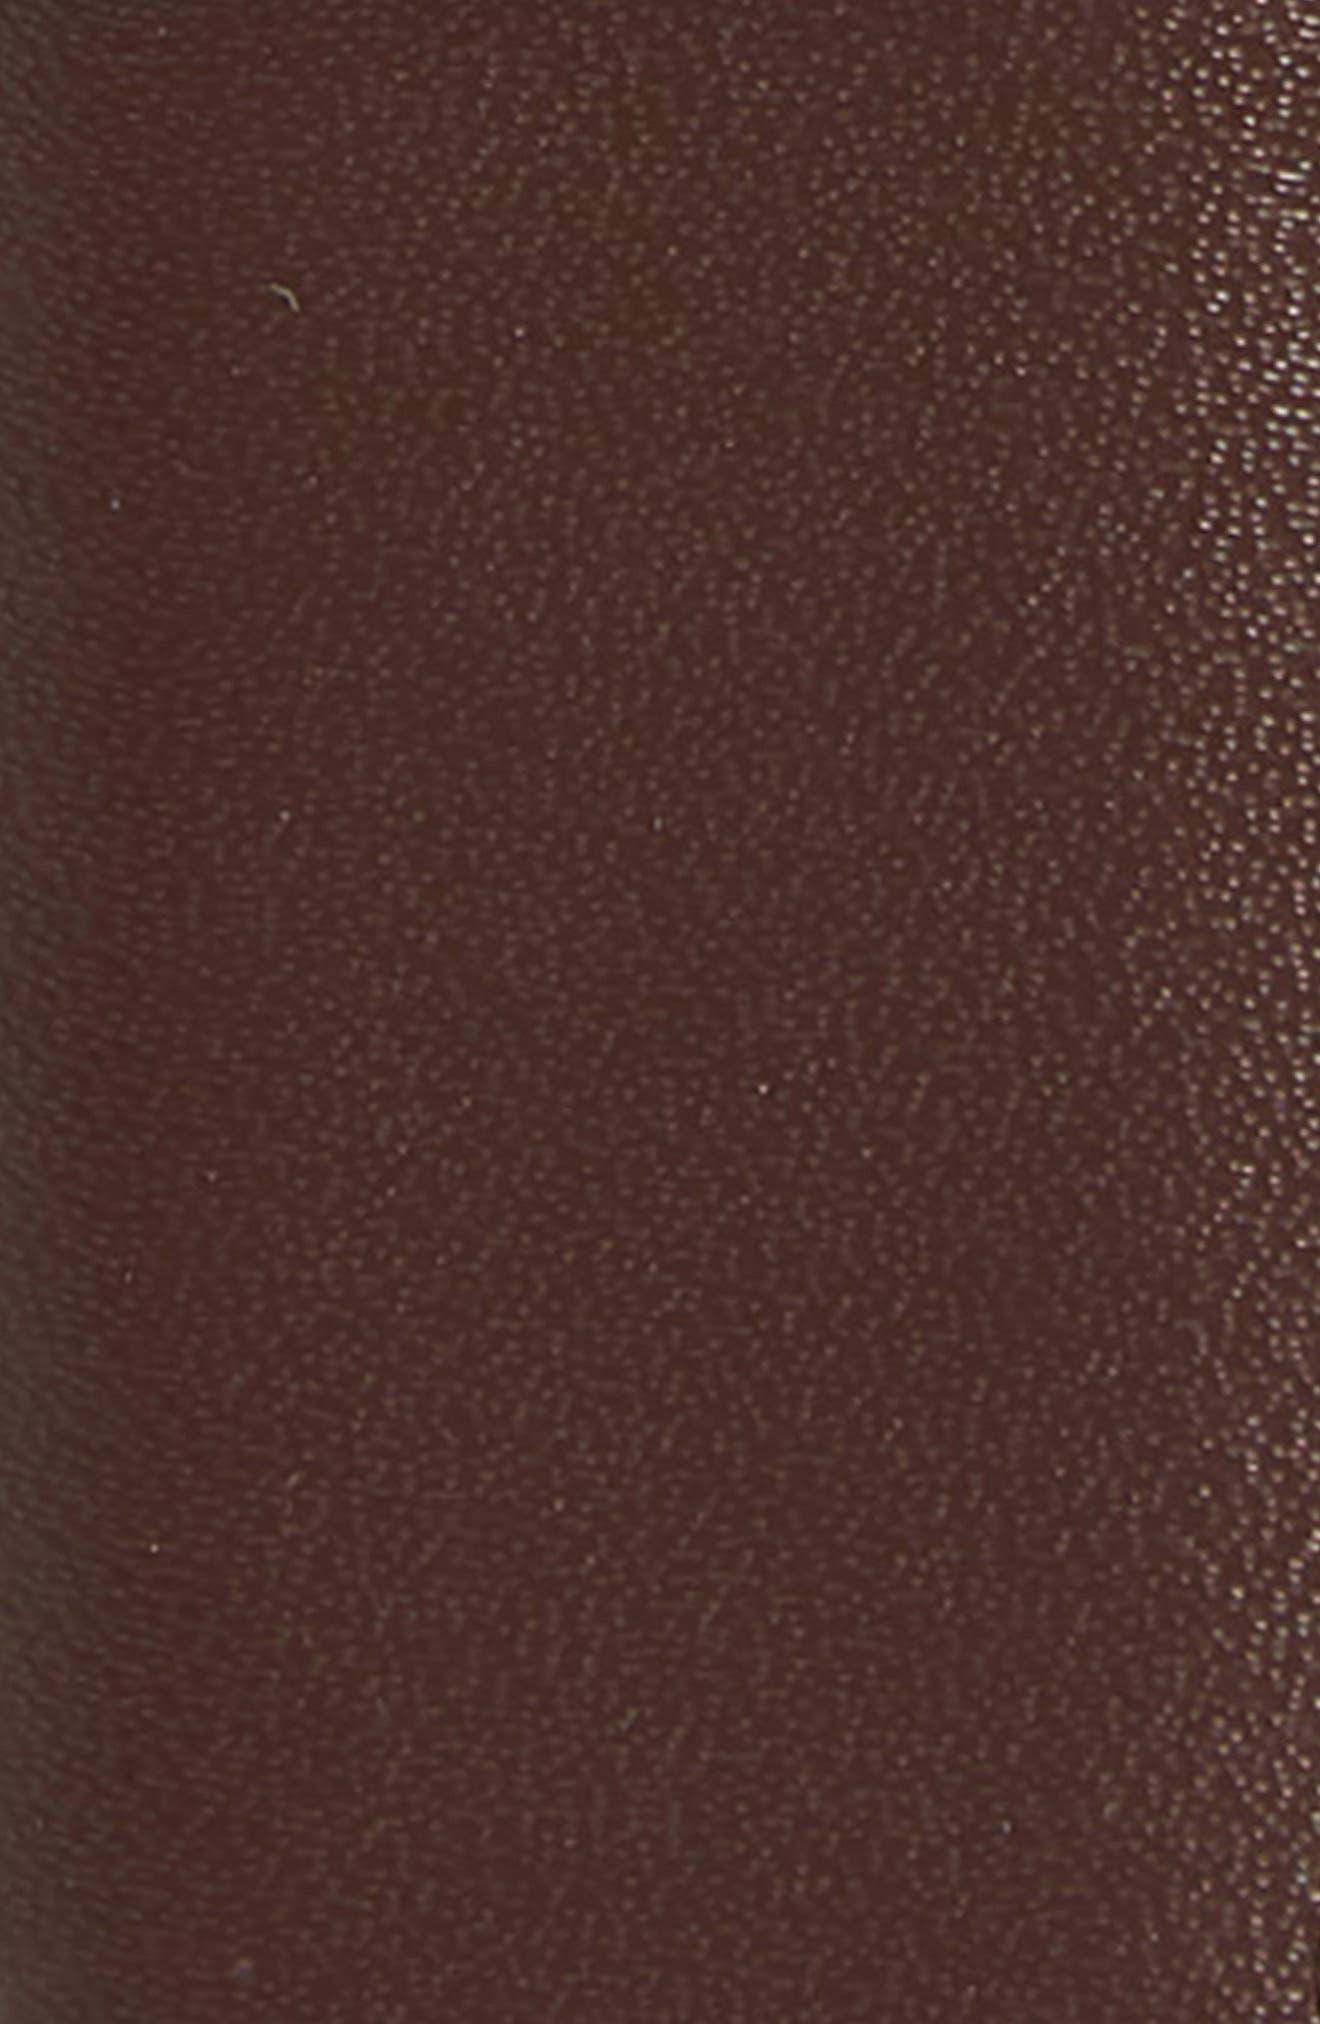 Newman Reversible Leather Belt,                             Alternate thumbnail 3, color,                             Black/ Brown